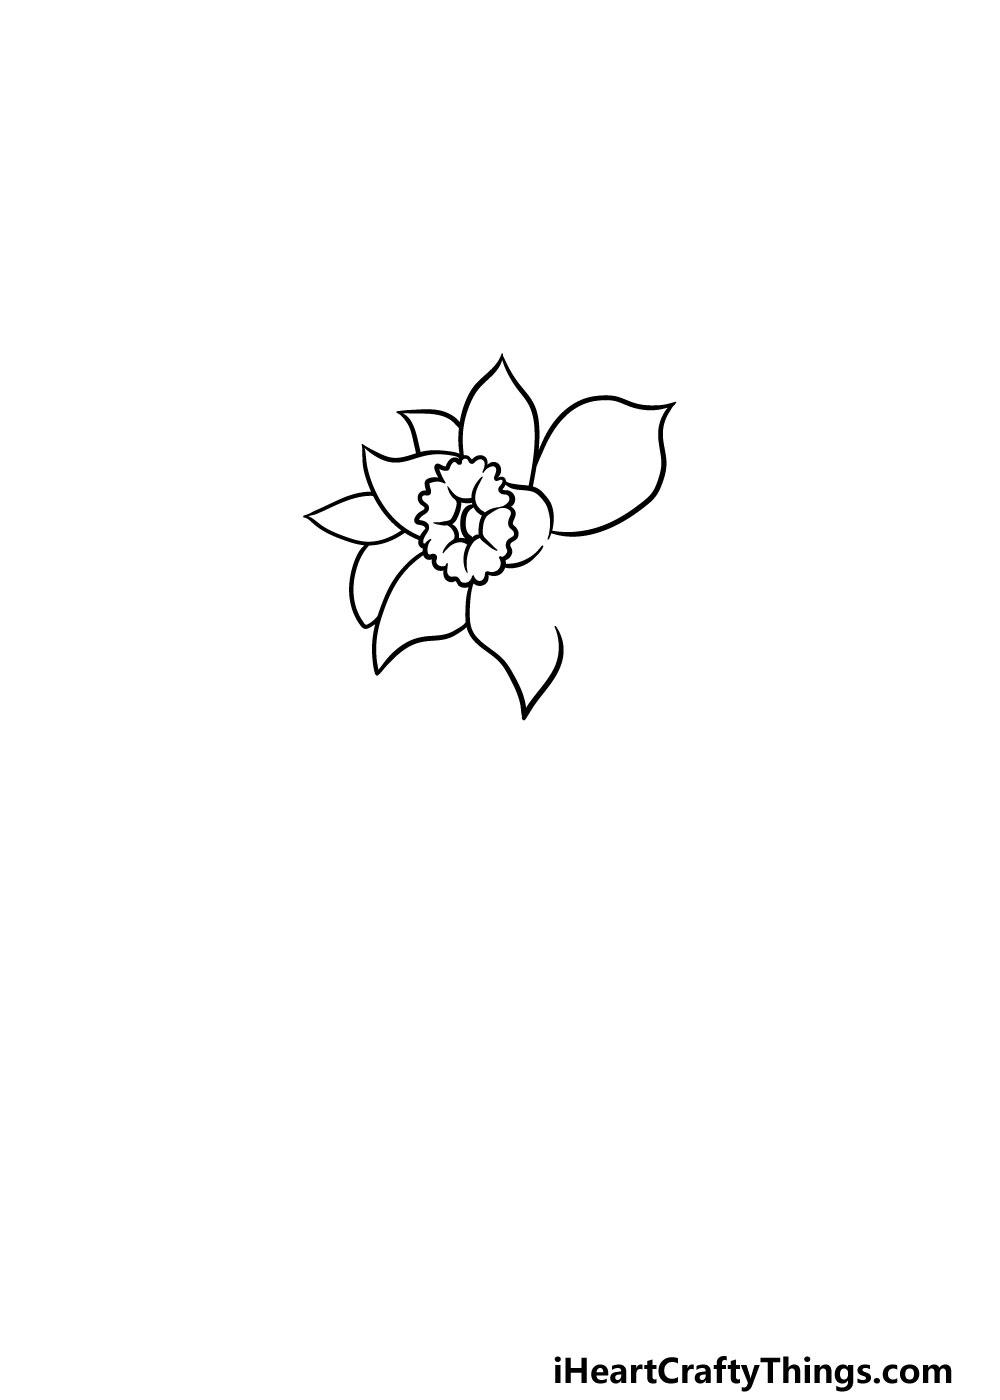 drawing a daffodil step 3